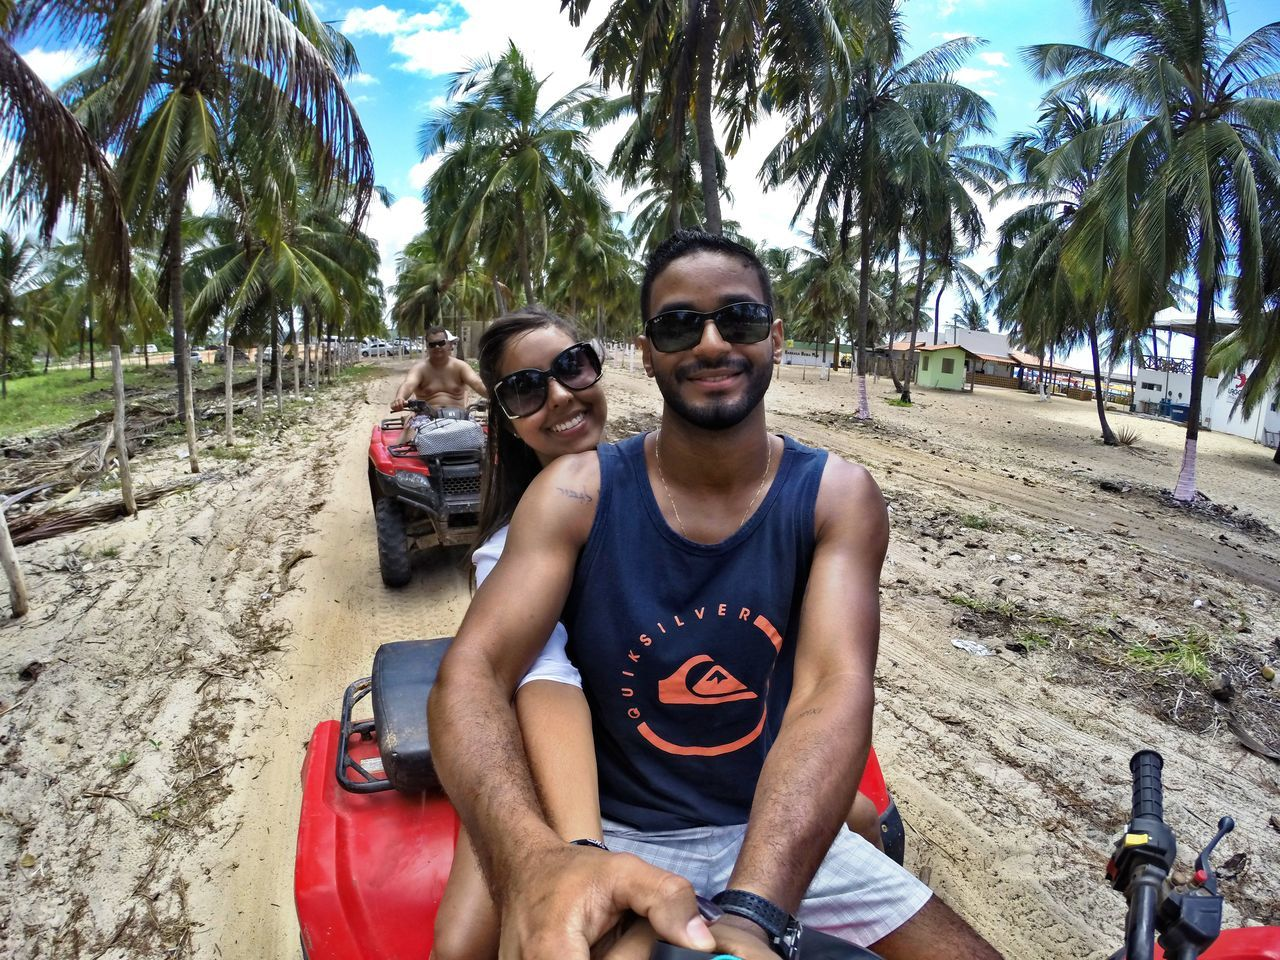 Praia do Gunga Alagoas/ Maceió Alagoas Quadriciclo GoPro Hero3+ Gopro Férias PraiadoGunga Beach Praia